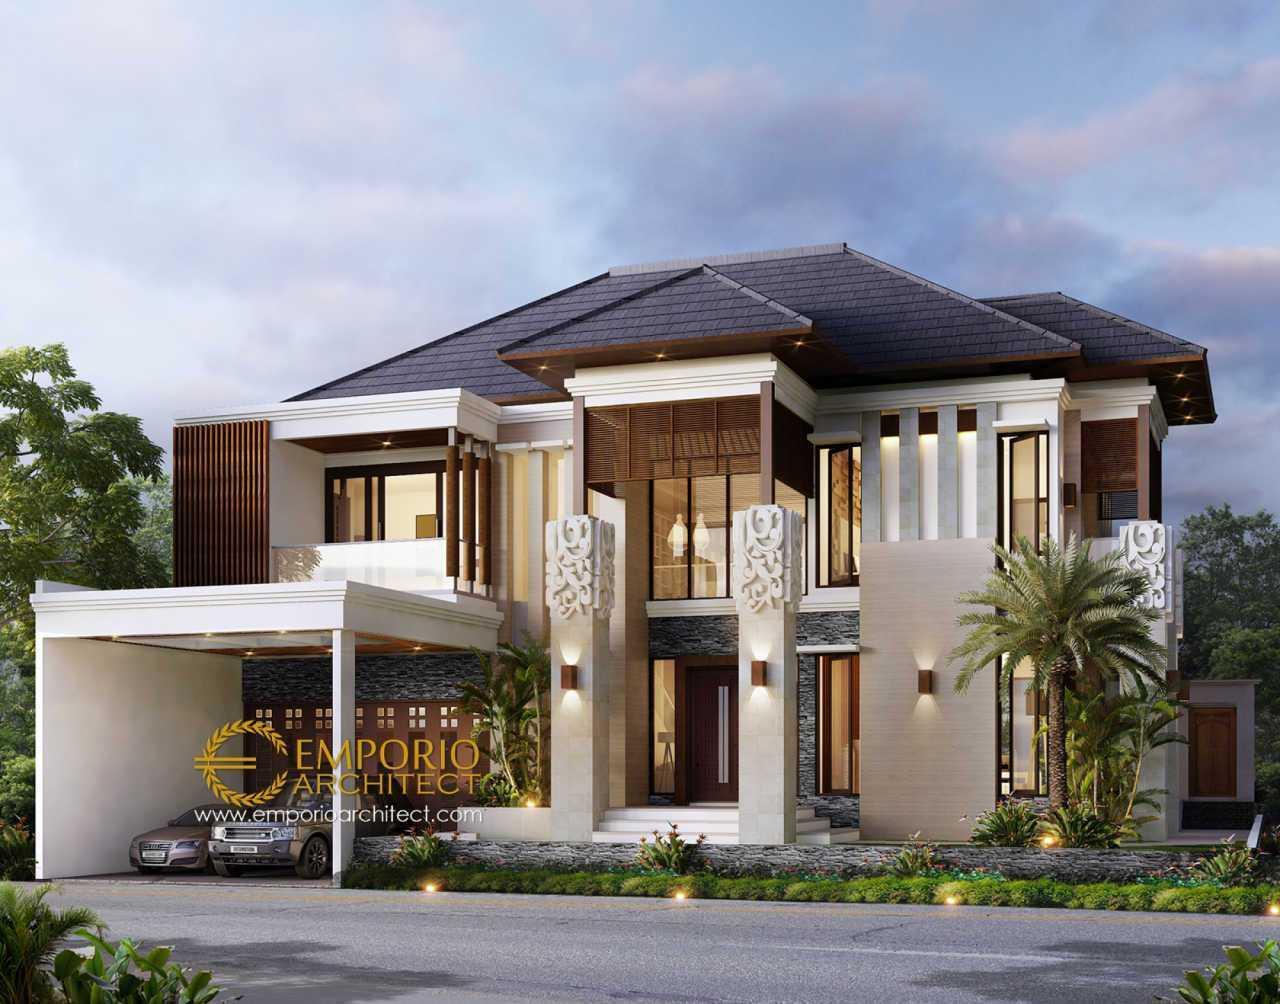 Emporio Architect Jasa Arsitek Bekasi Desain Rumah Villa Bali 2 Lantai 390 @ Bekasi Bekasi, Kota Bks, Jawa Barat, Indonesia Bekasi, Kota Bks, Jawa Barat, Indonesia Emporio-Architect-Jasa-Arsitek-Bekasi-Desain-Rumah-Villa-Bali-2-Lantai-390-Bekasi Tropical 91090